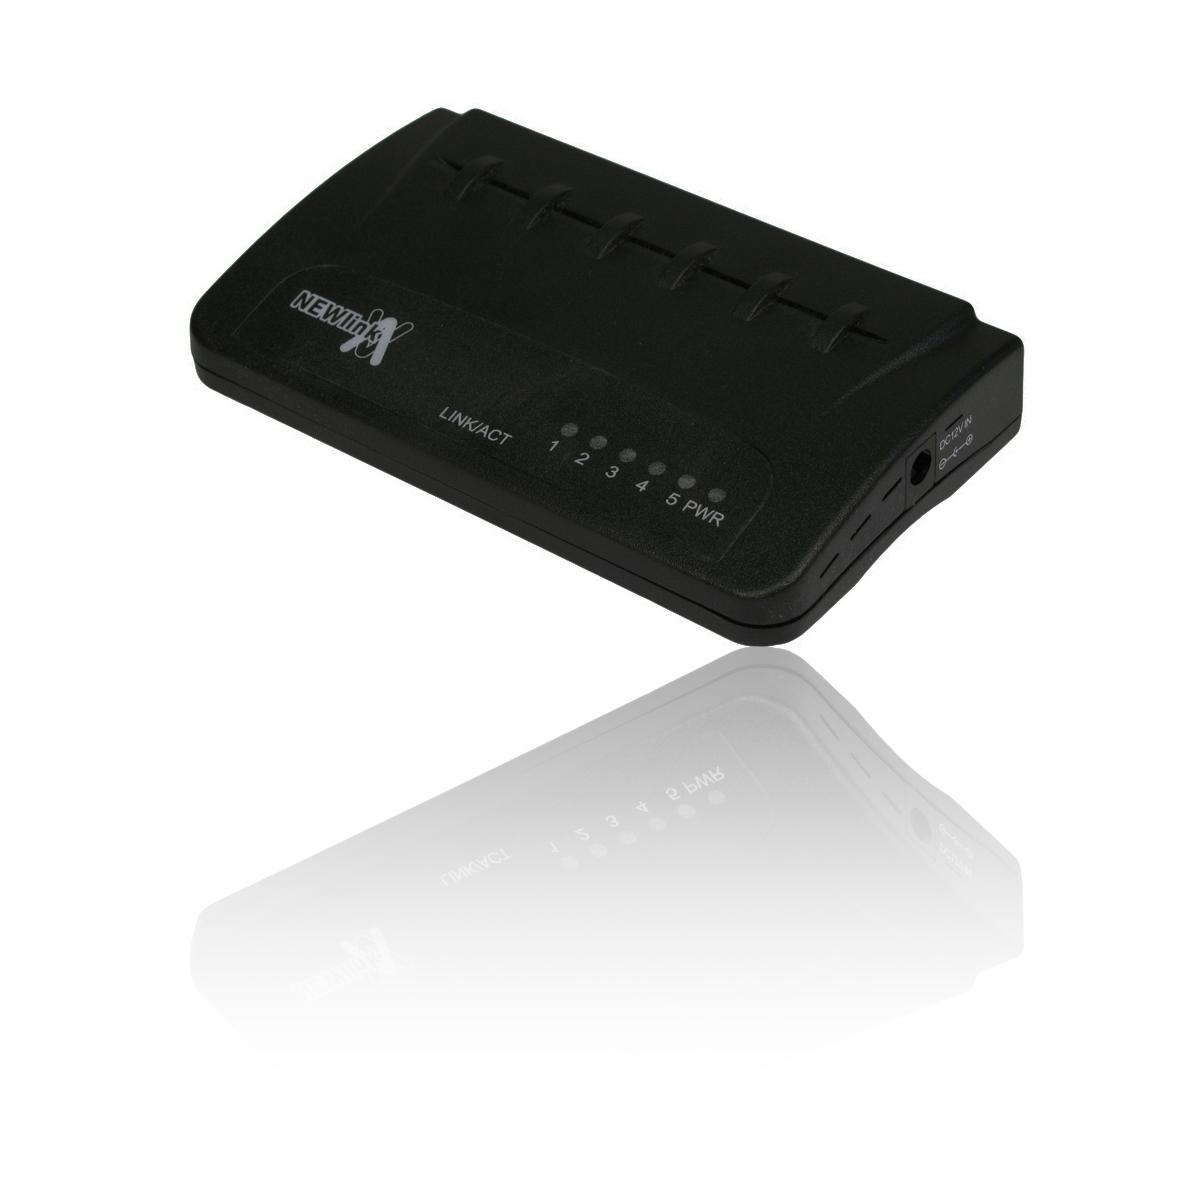 hight resolution of 5 port rj45 nway lan network ethernet hub switch splitter 10 100 4 extra ports